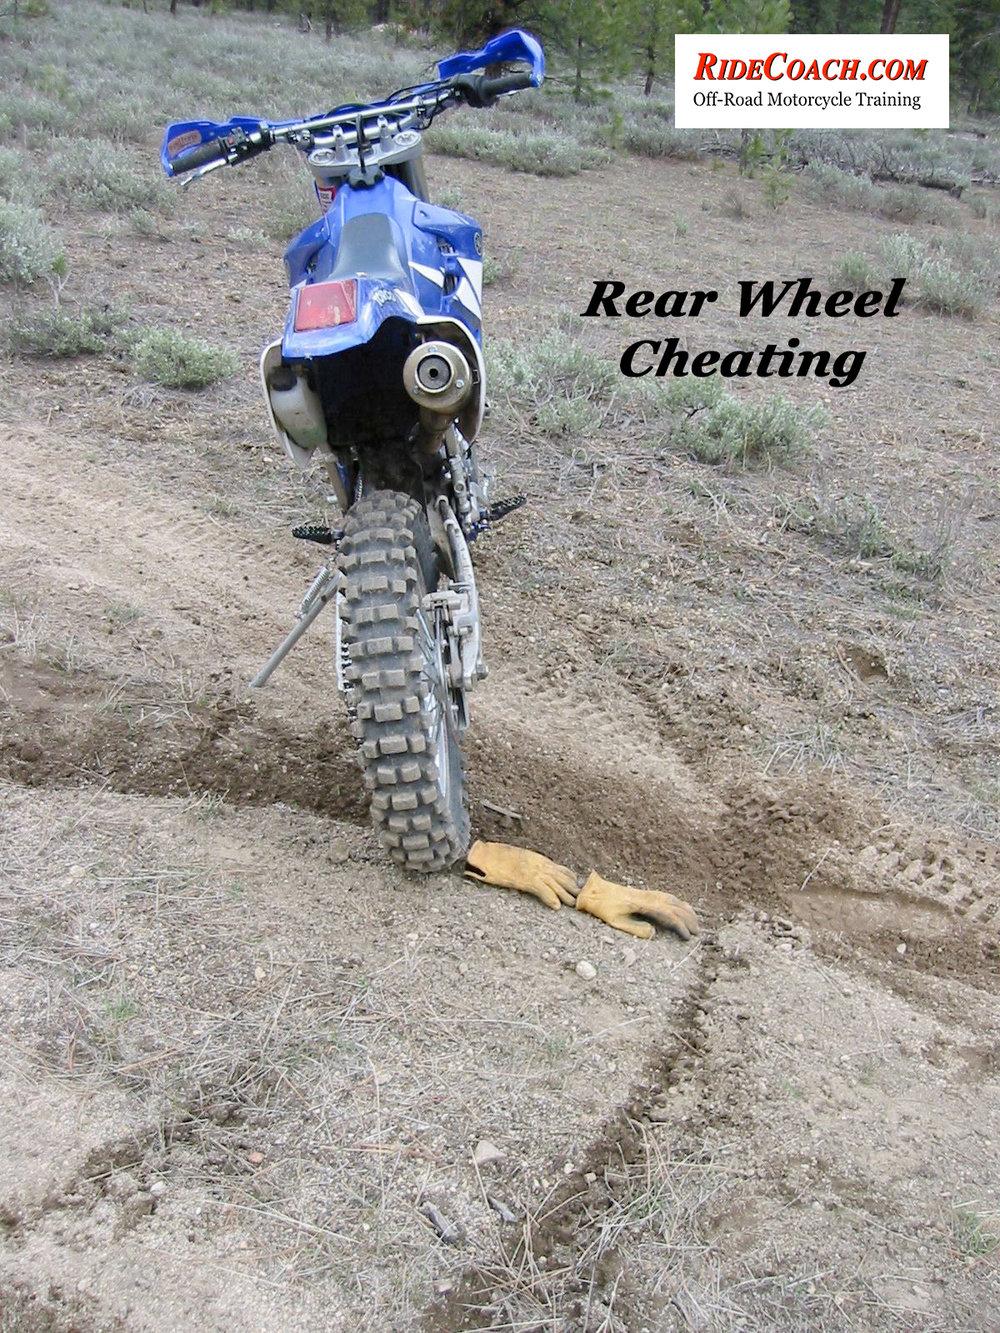 Rear-Wheel-Cheating-Coach-Ramey-Stroud-Adventure-Rider-Radio-Rider-Skills.jpg